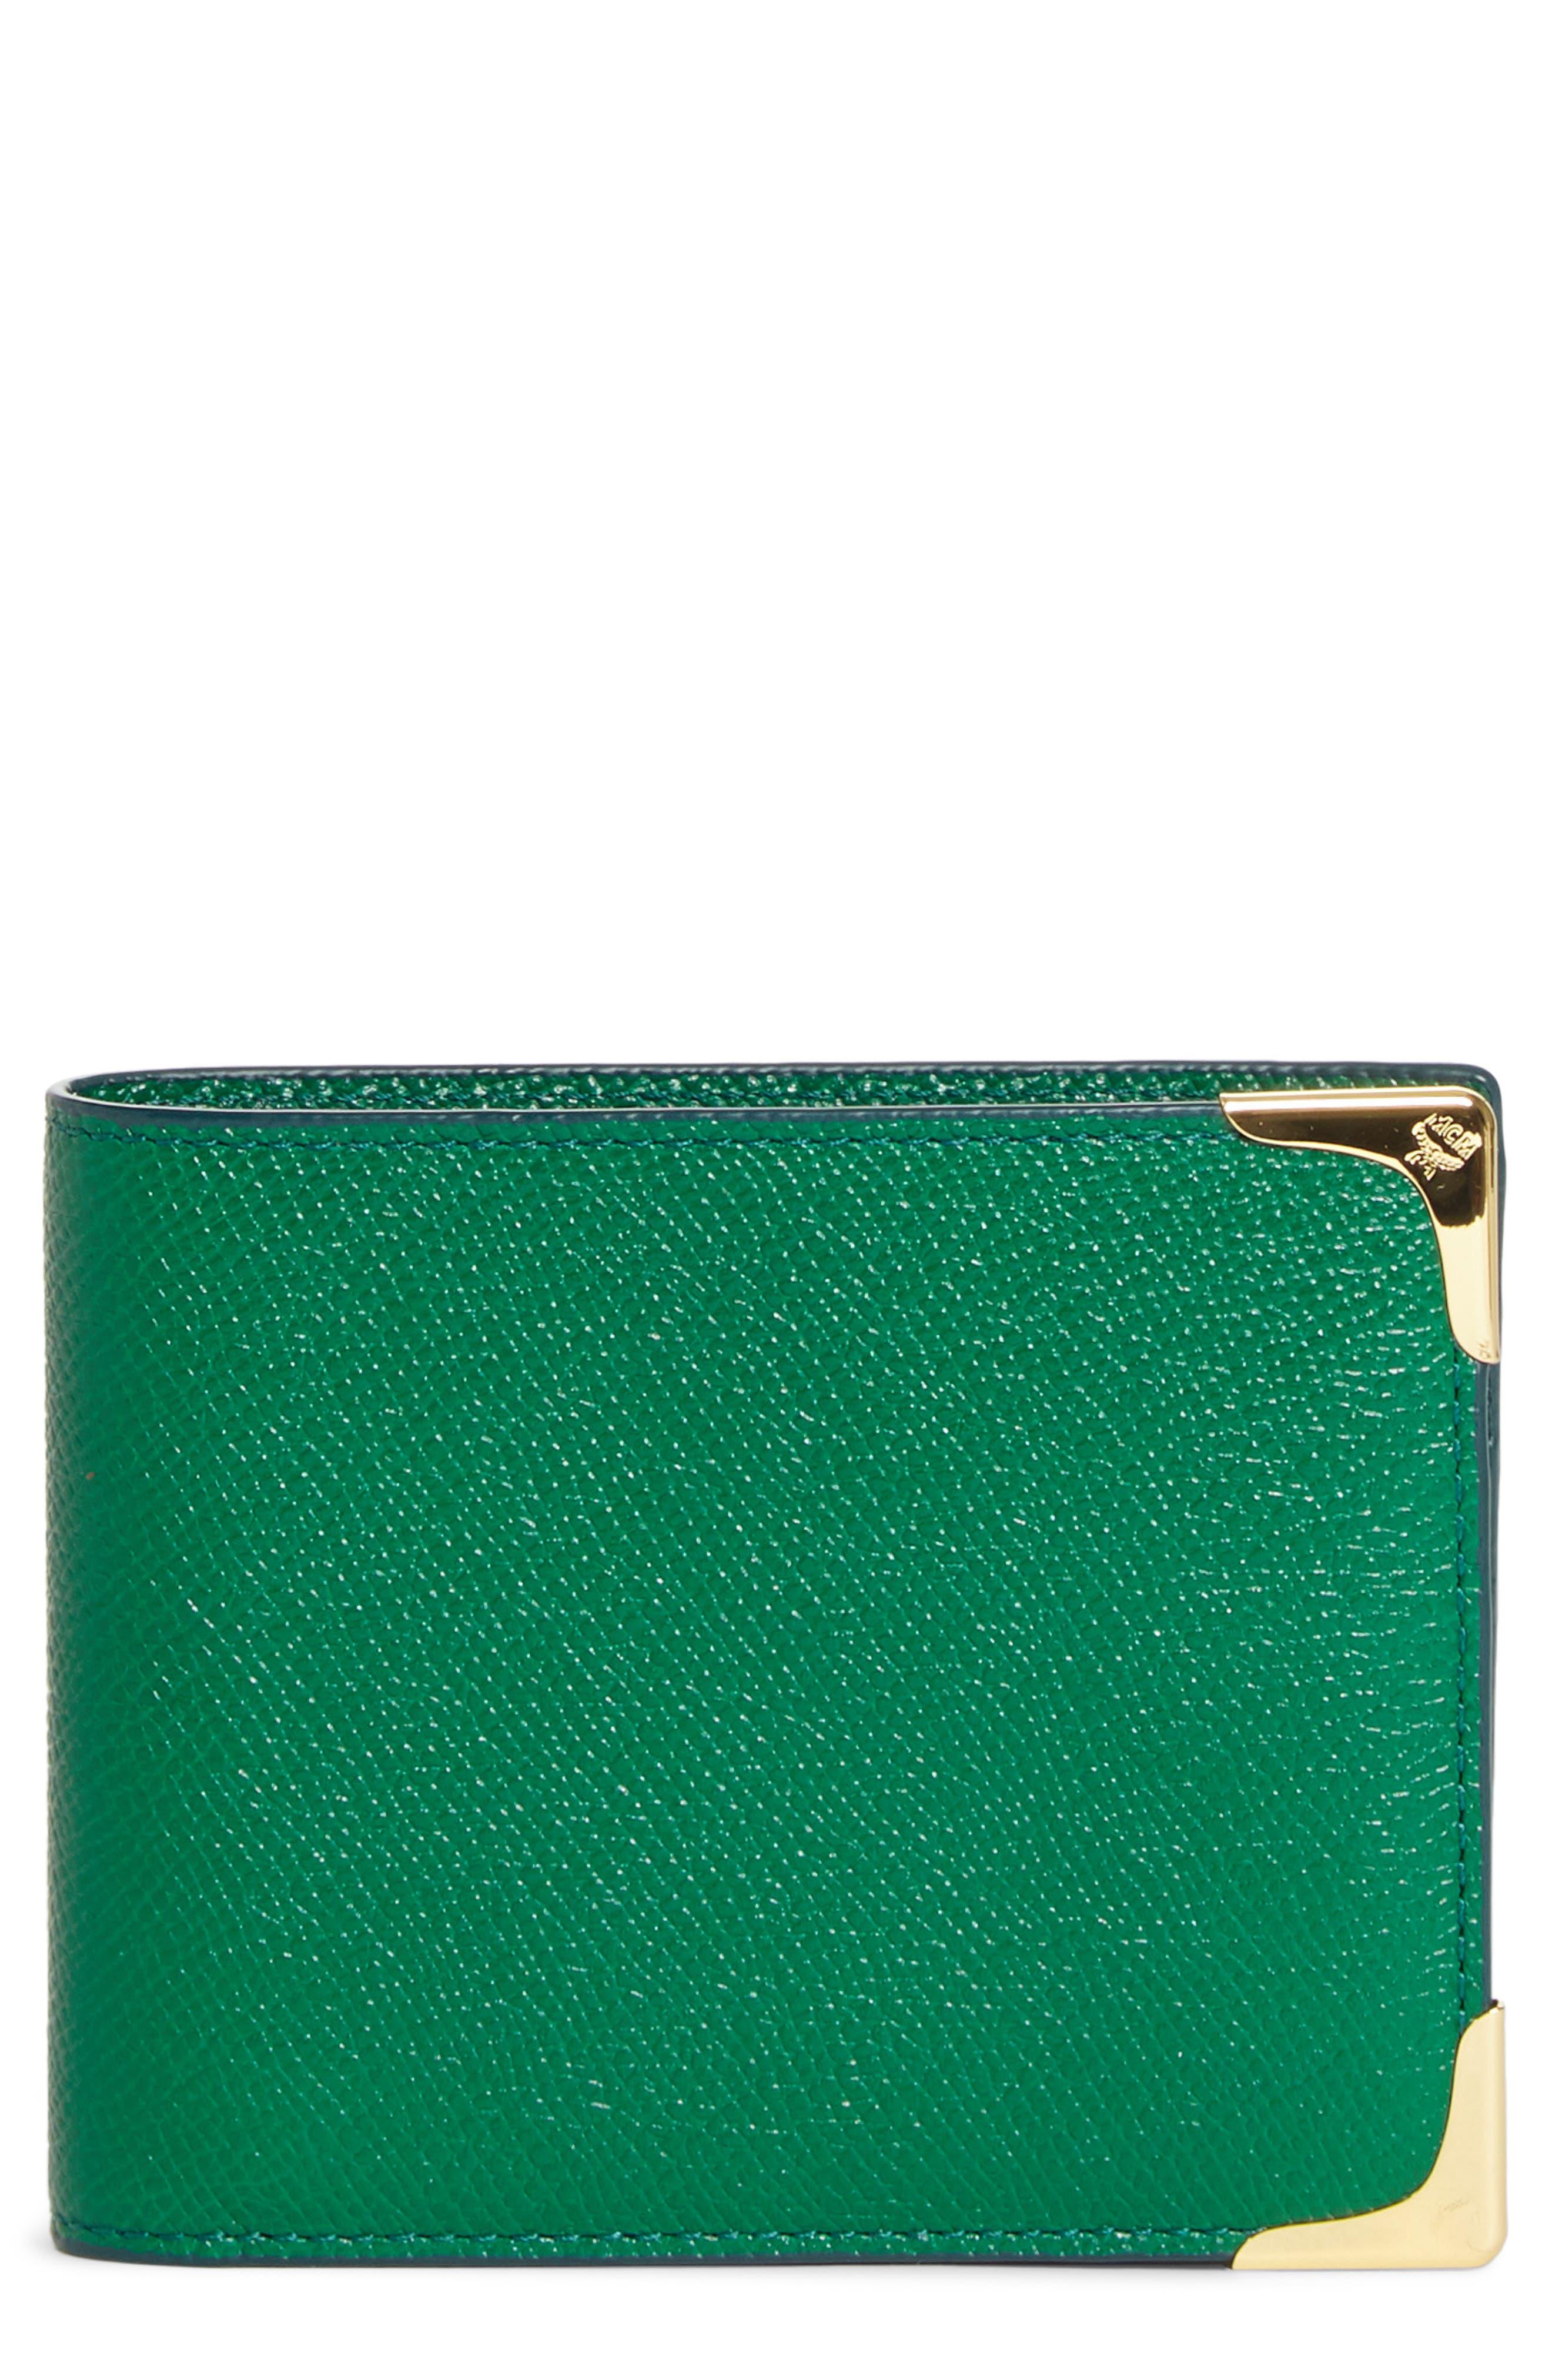 MCM Small RGB Coin Wallet, Main, color, GREEN